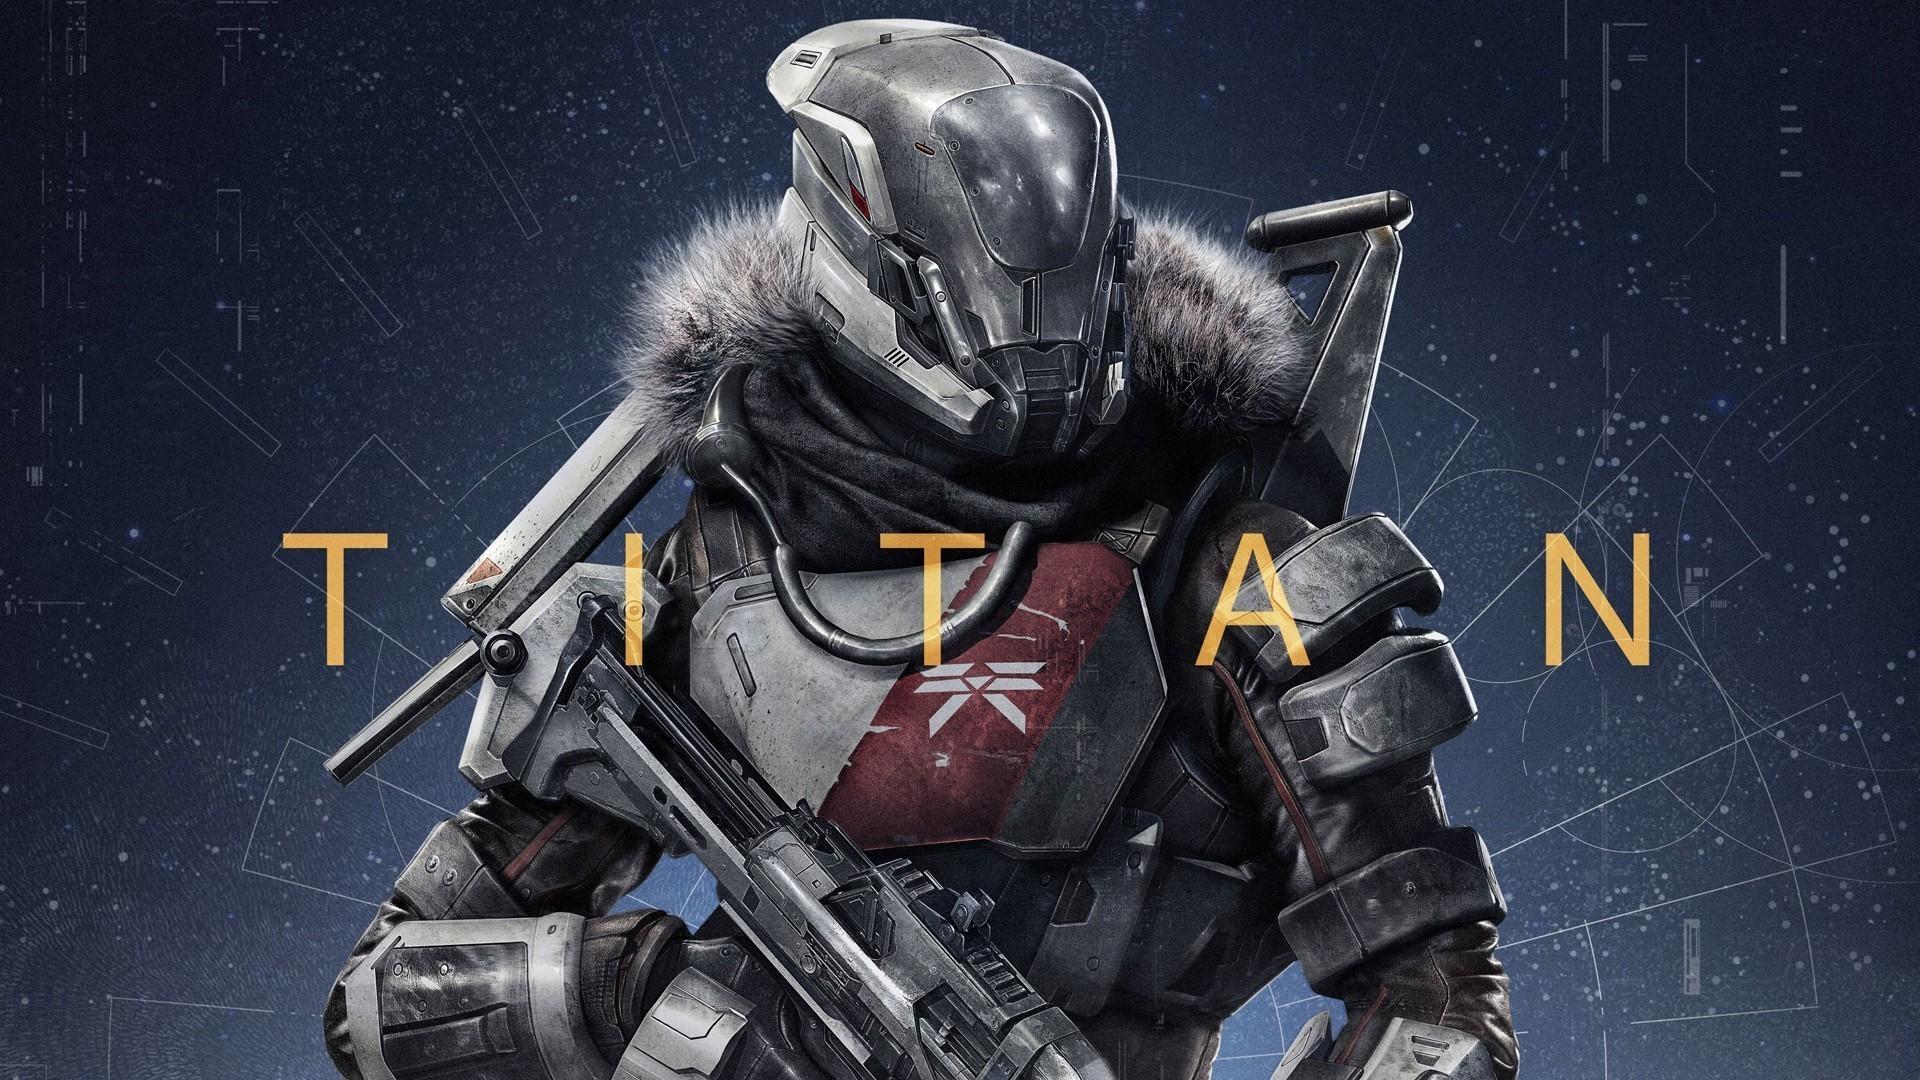 Titan in Destiny Wallpapers | HD Wallpapers